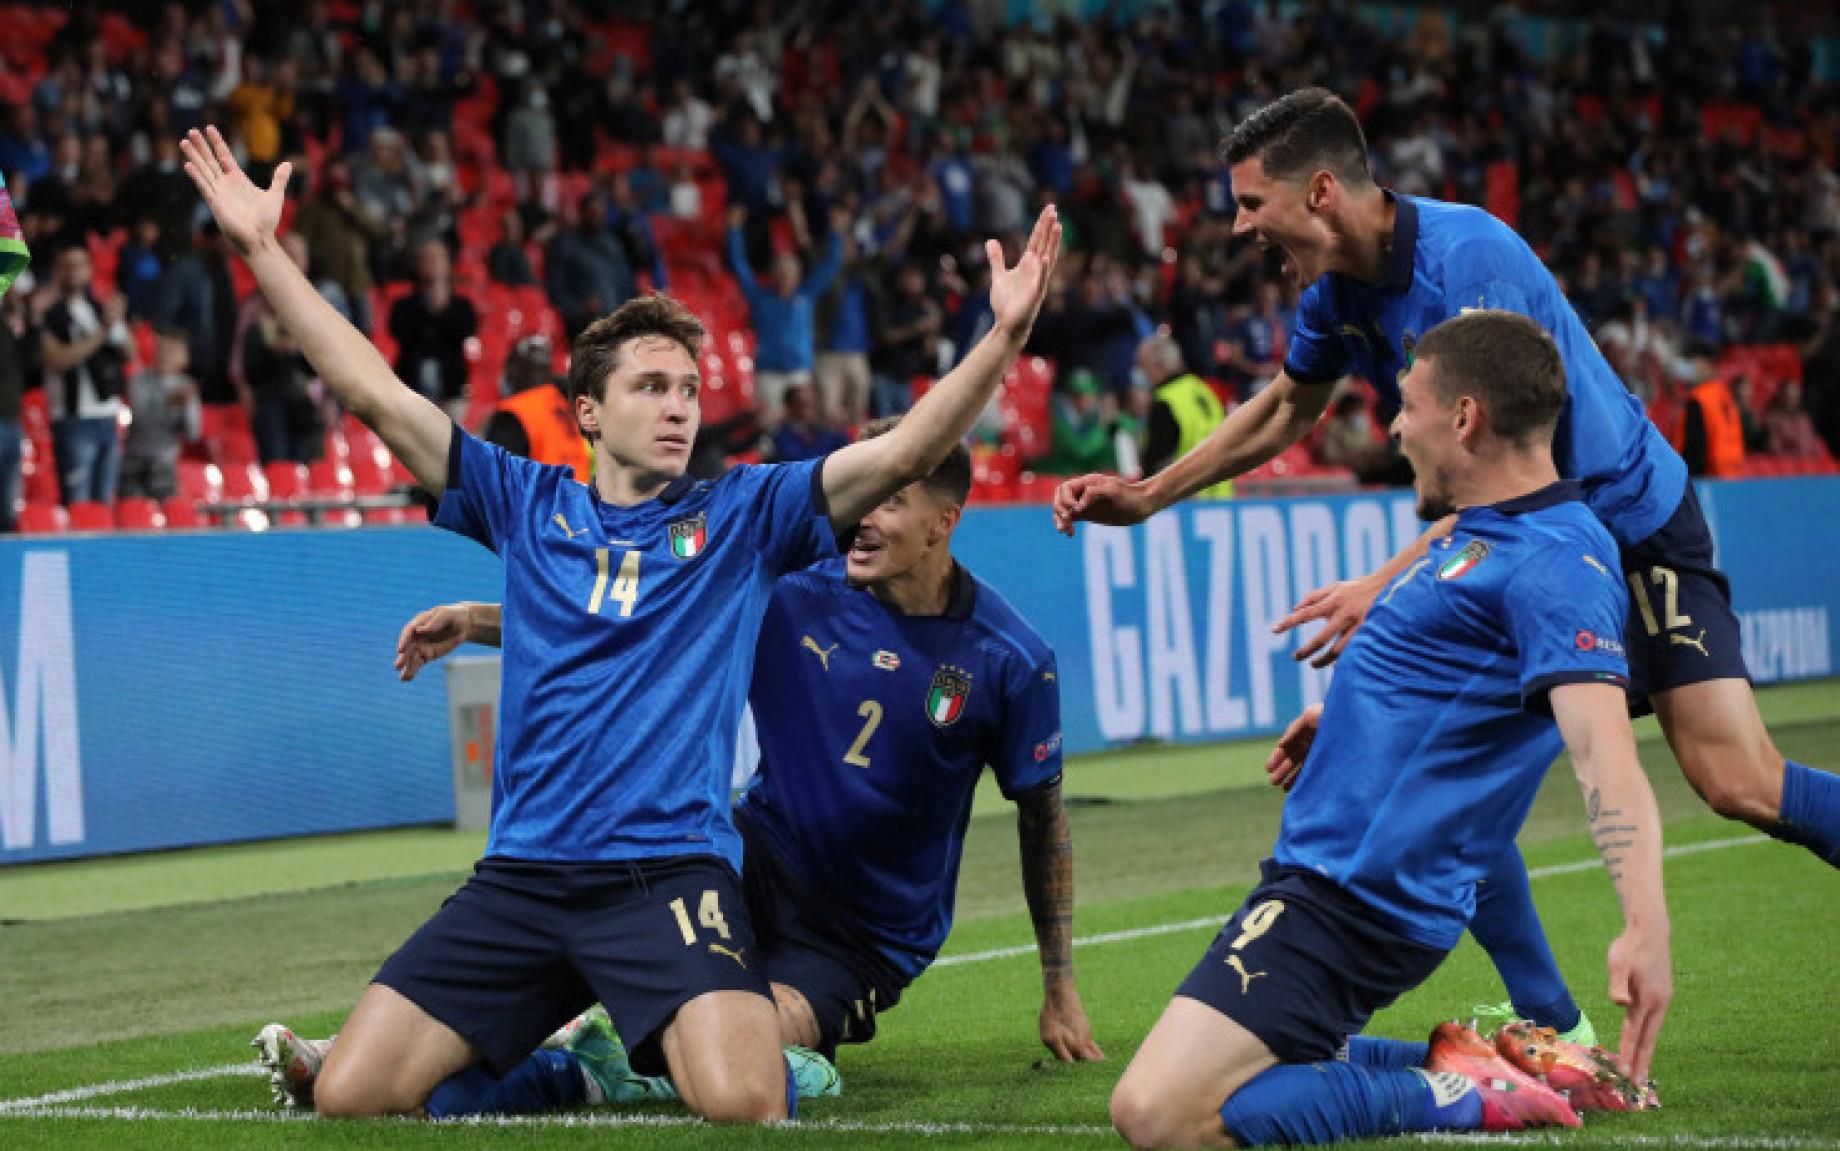 italia-austria-image.jpg